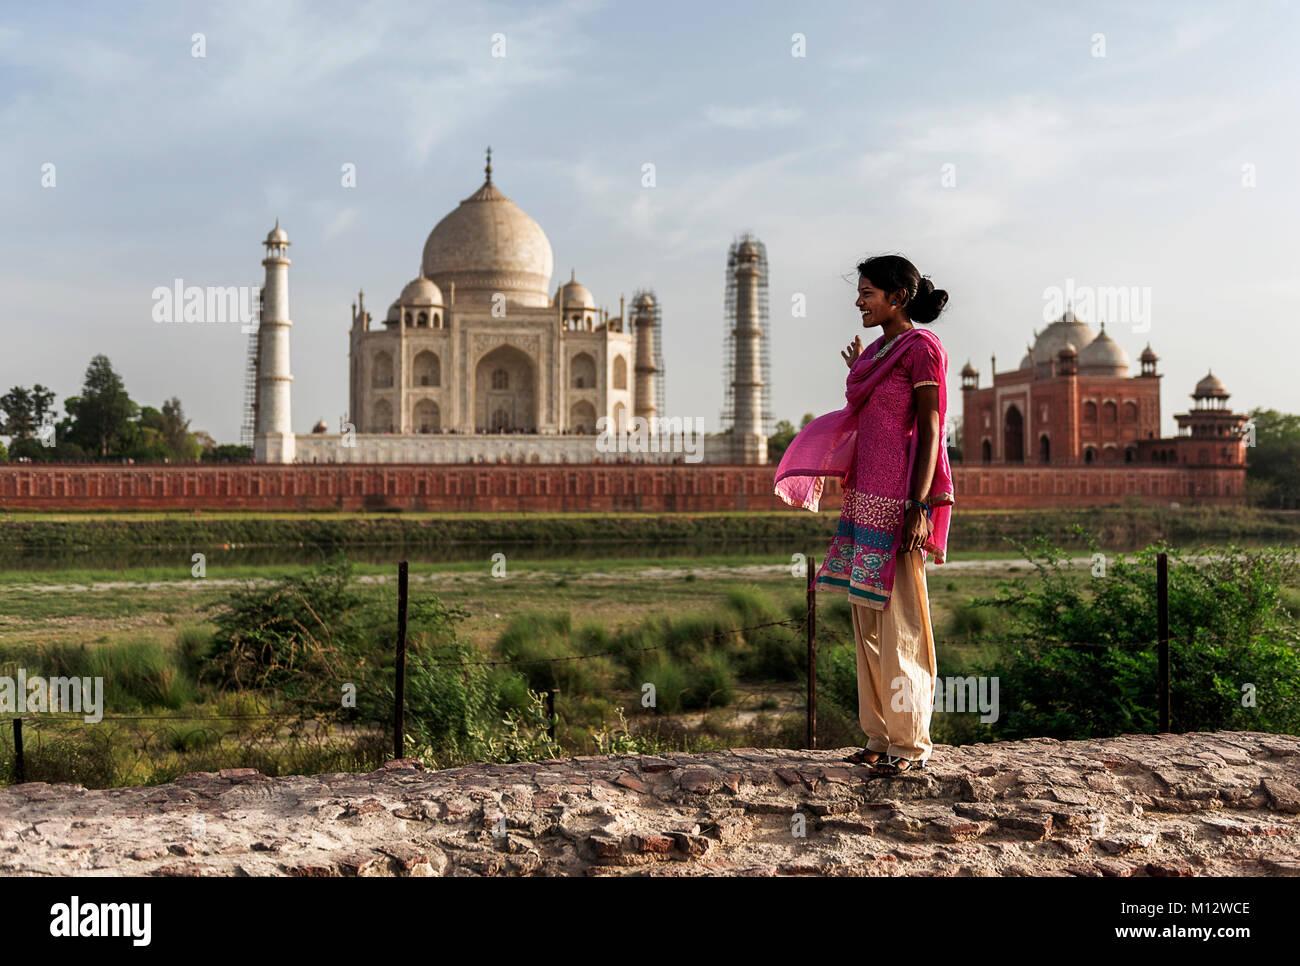 Local woman cheerfully enjoying the amazing view of Taj Mahal, Agra, India. - Stock Image